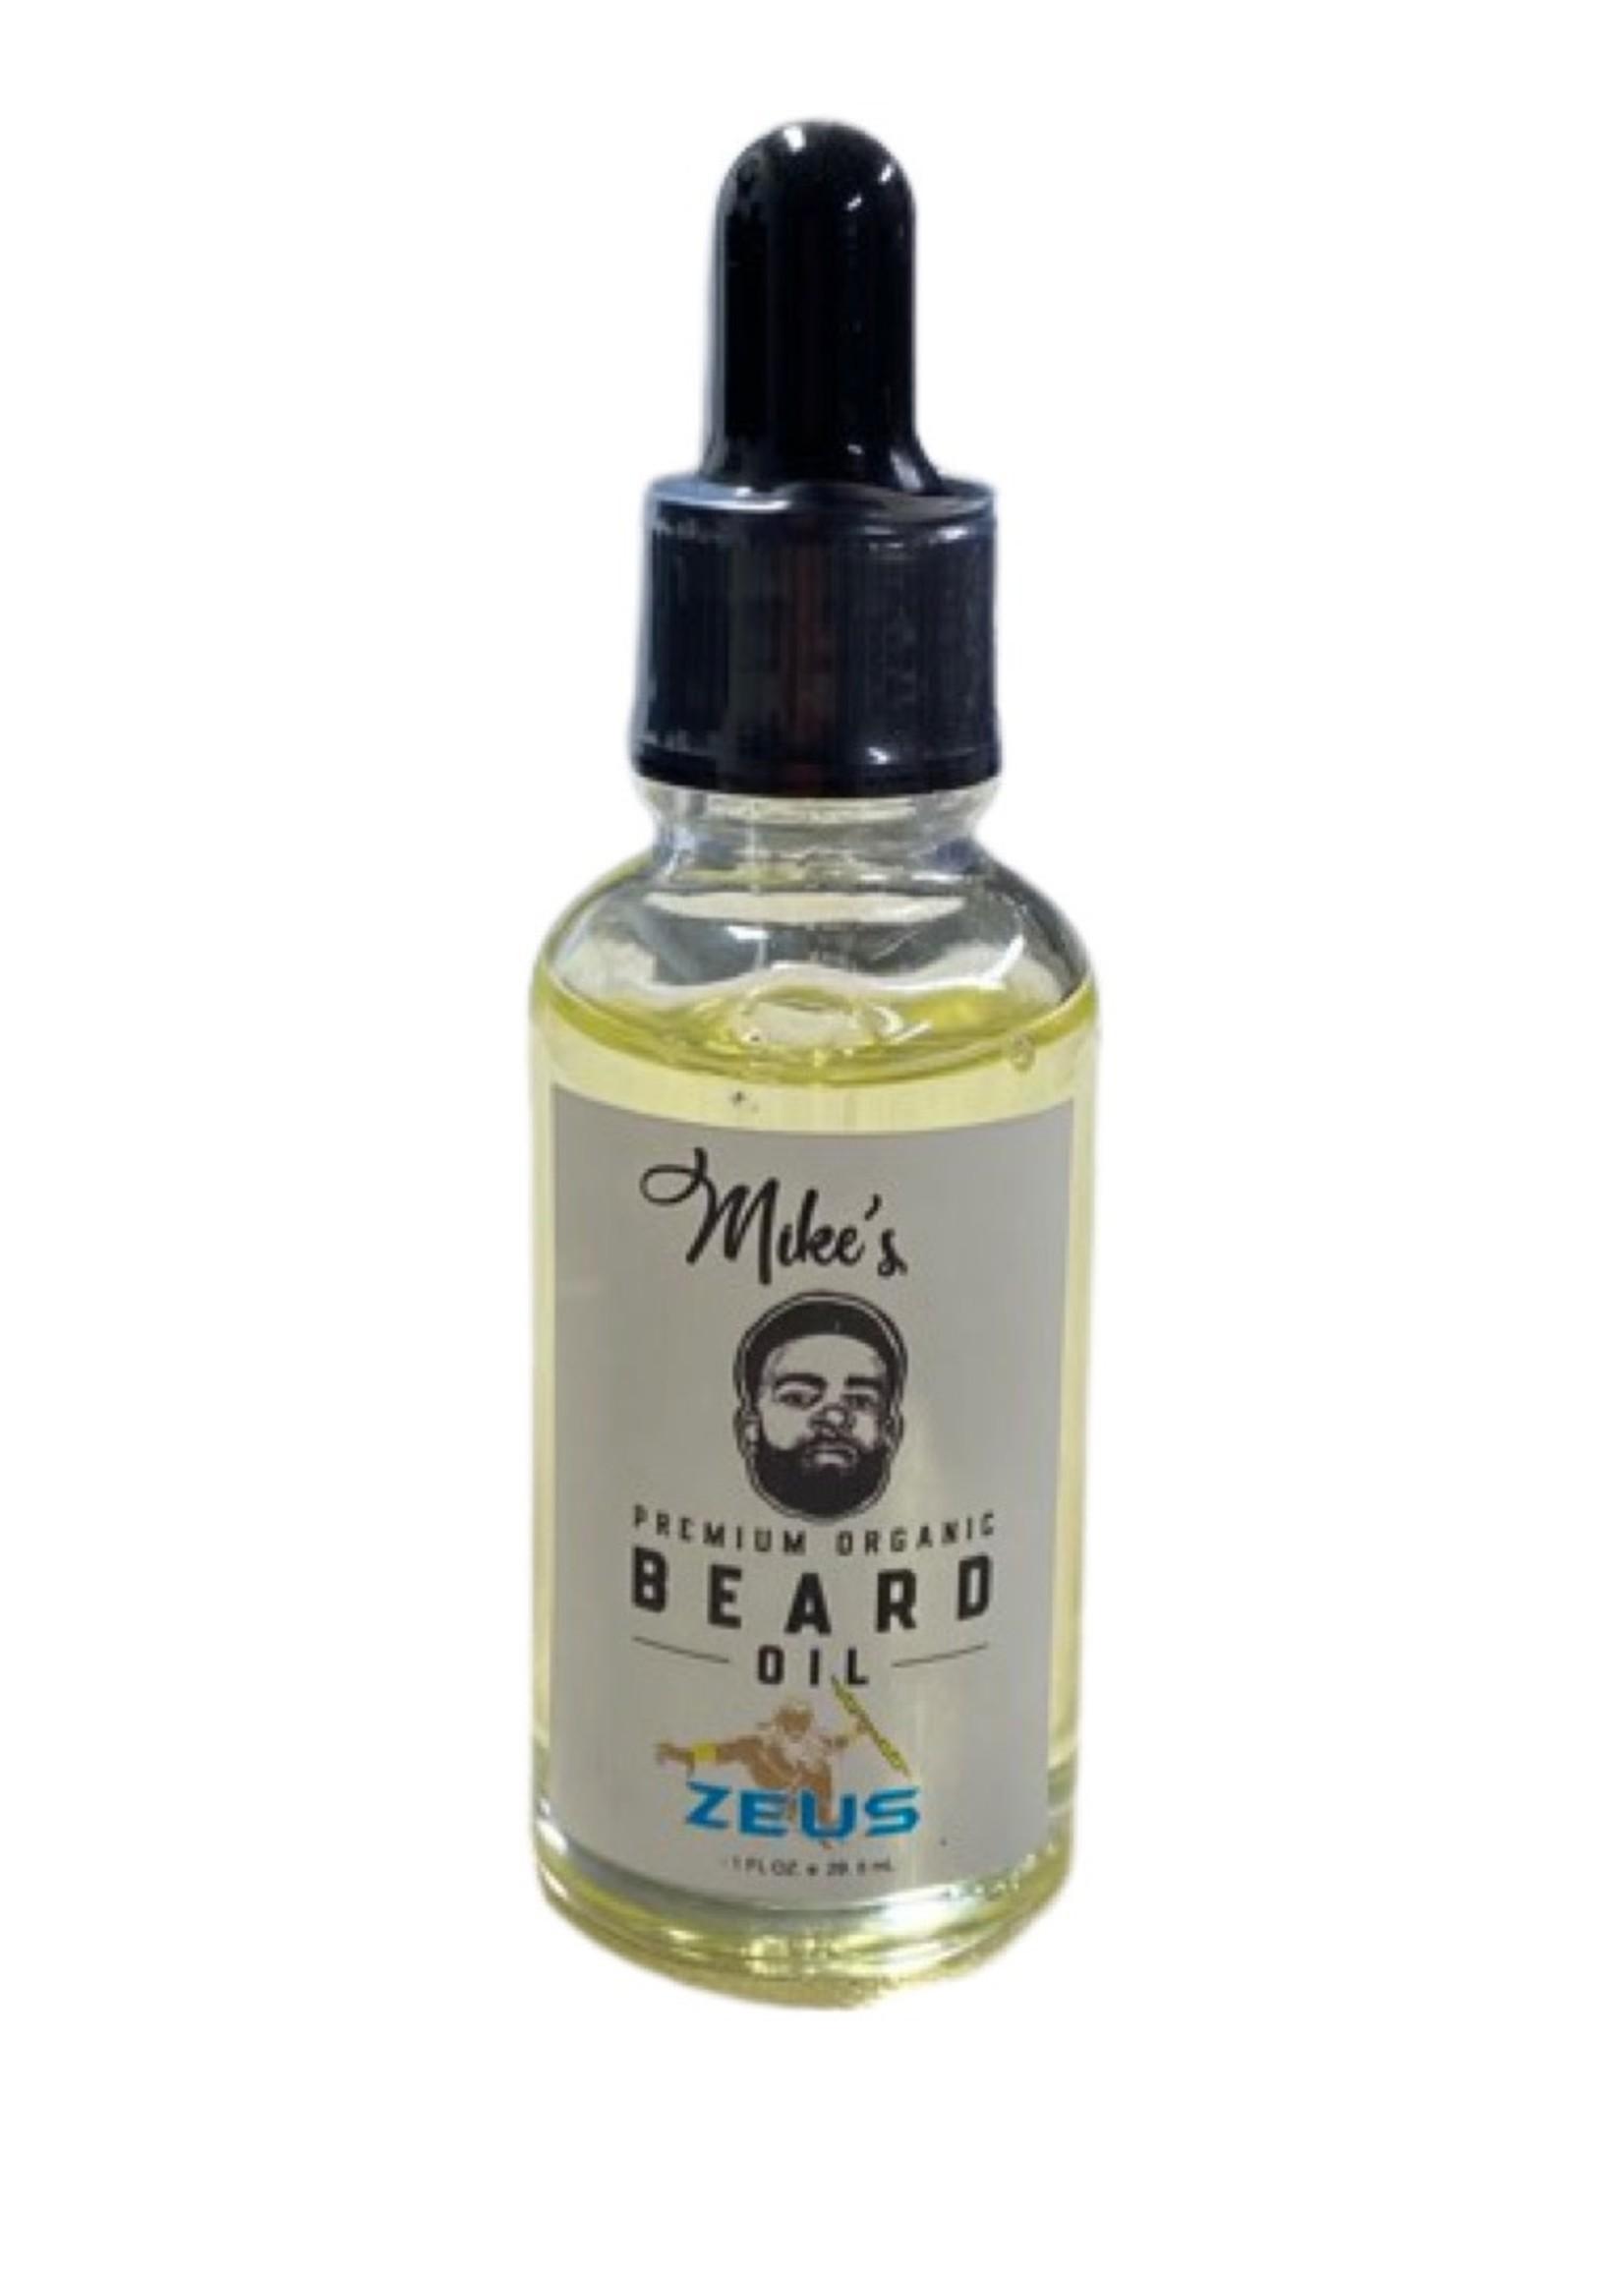 Mike's Premium Organic Beard Oil- Zeus